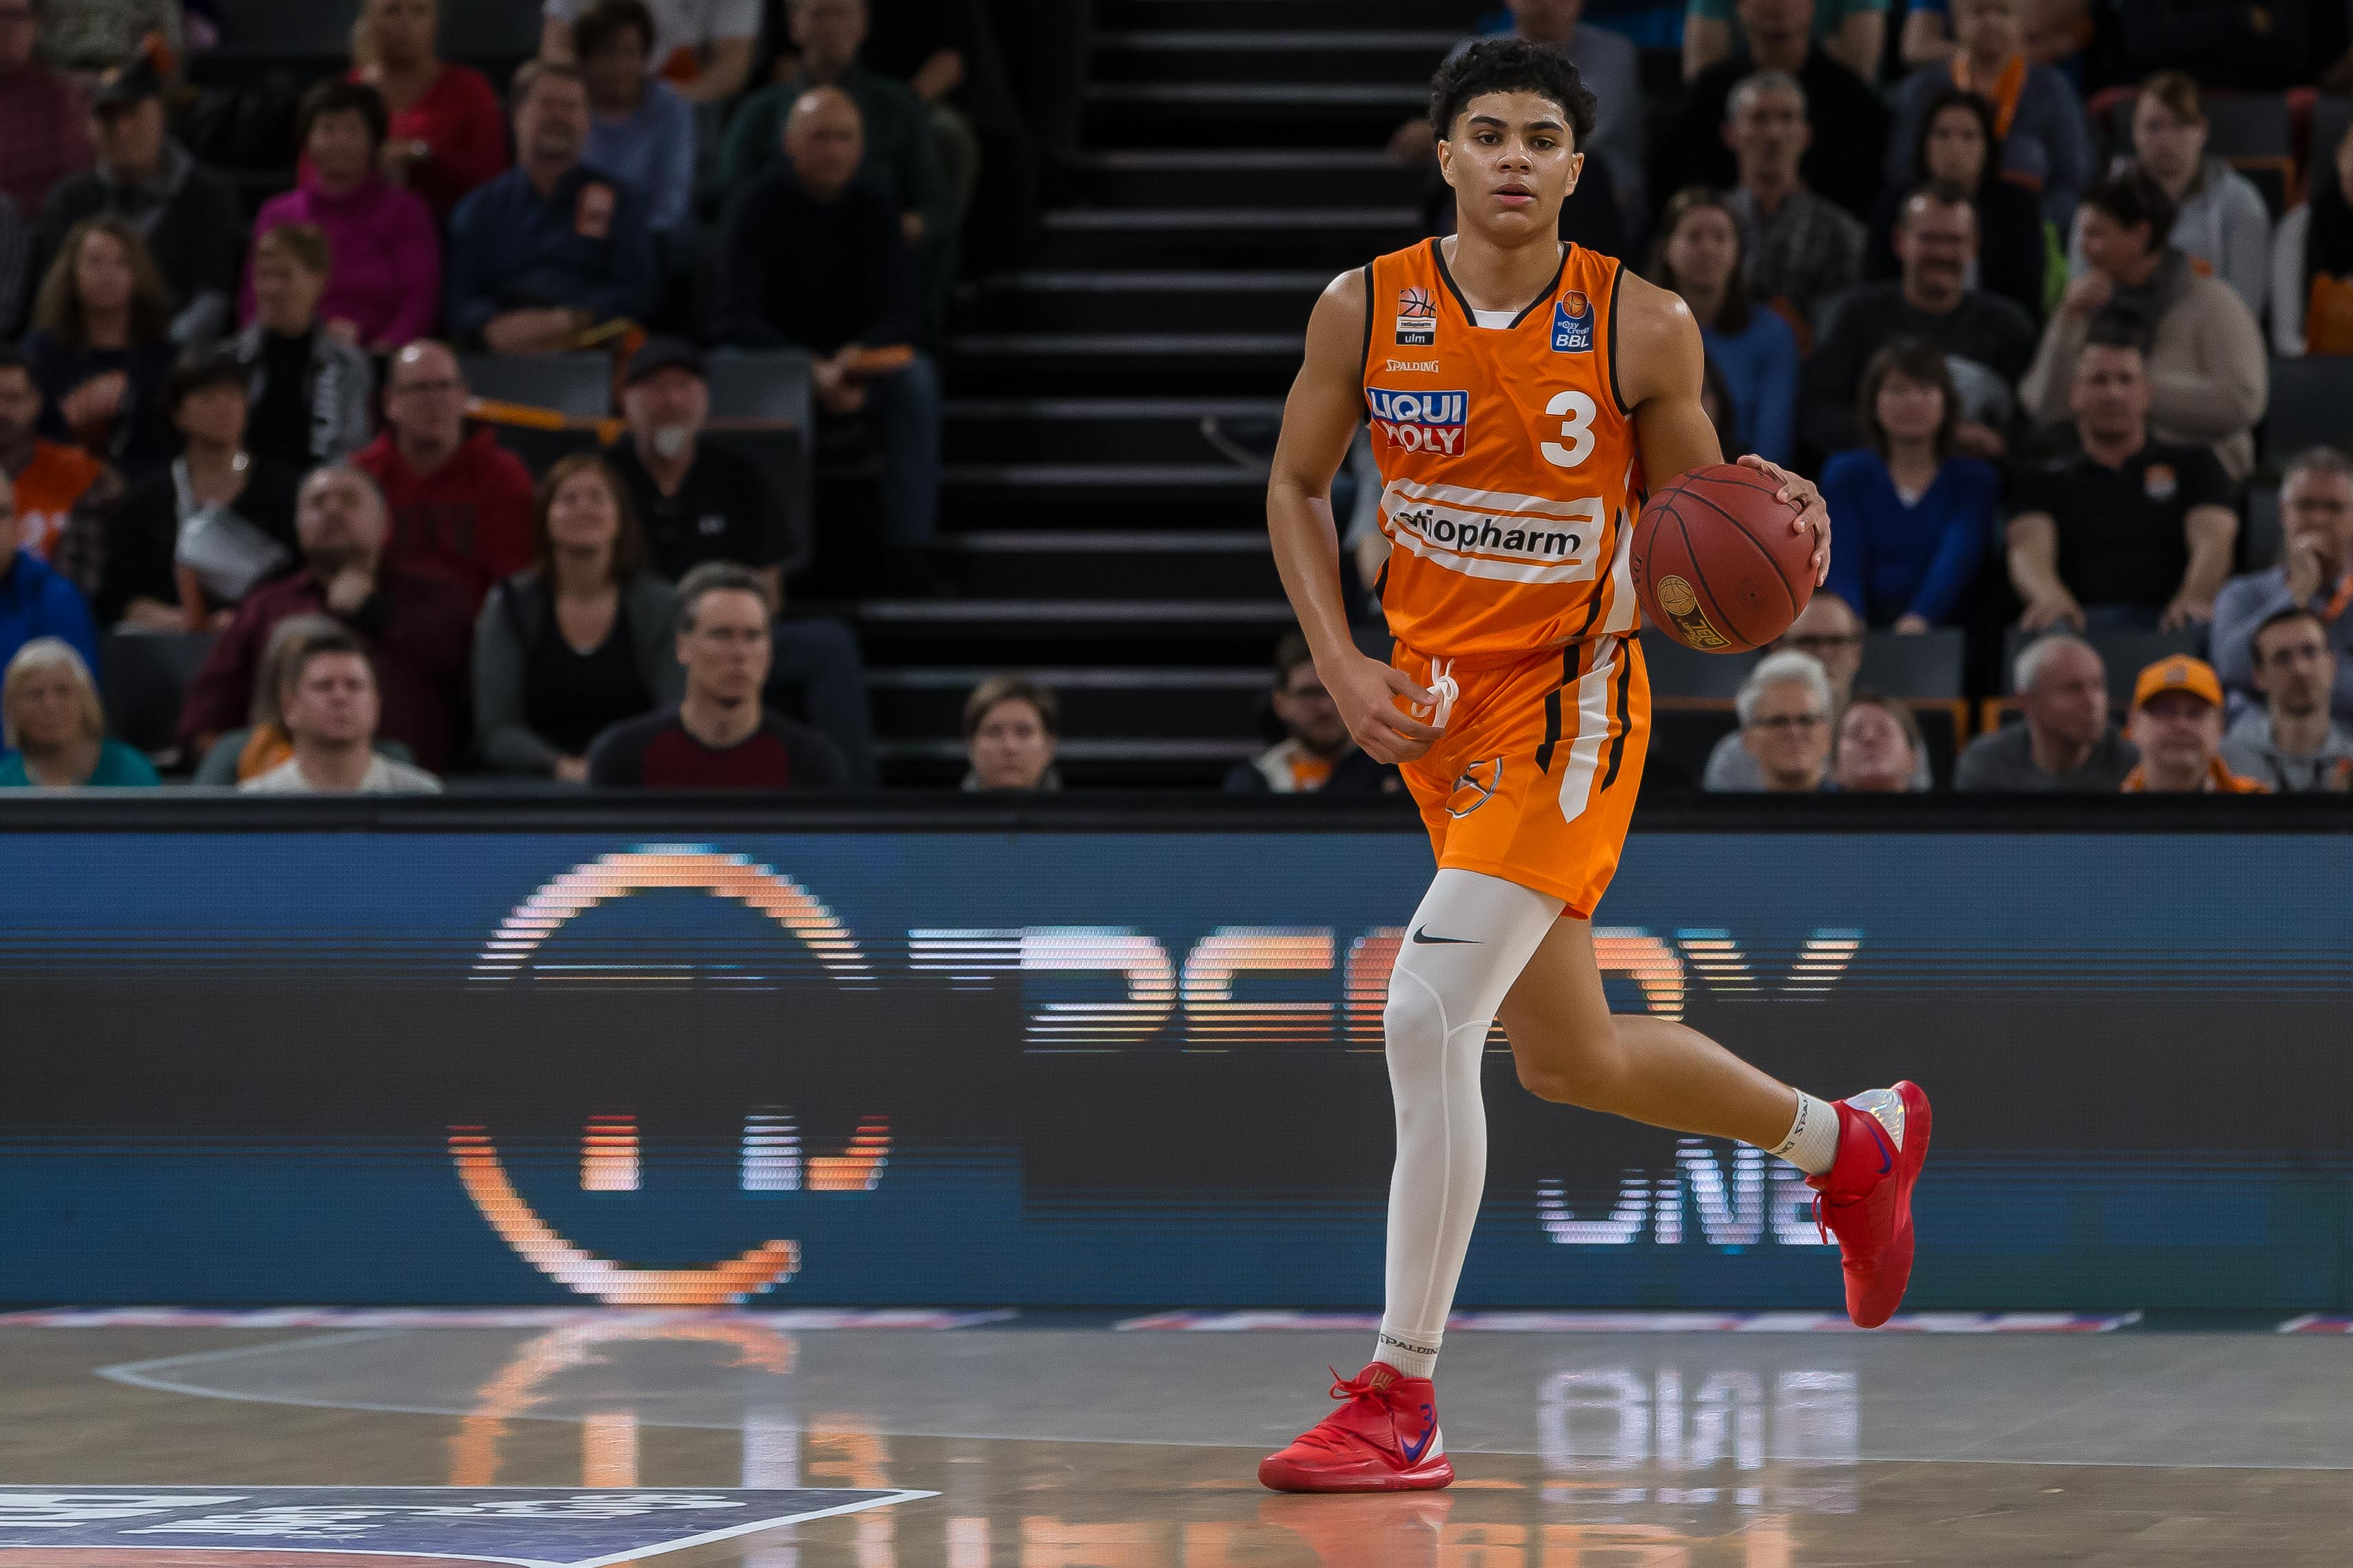 Ratiopharm Ulm v MHP Riesen Ludwigsburg - EasyCredit Basketball Bundesliga